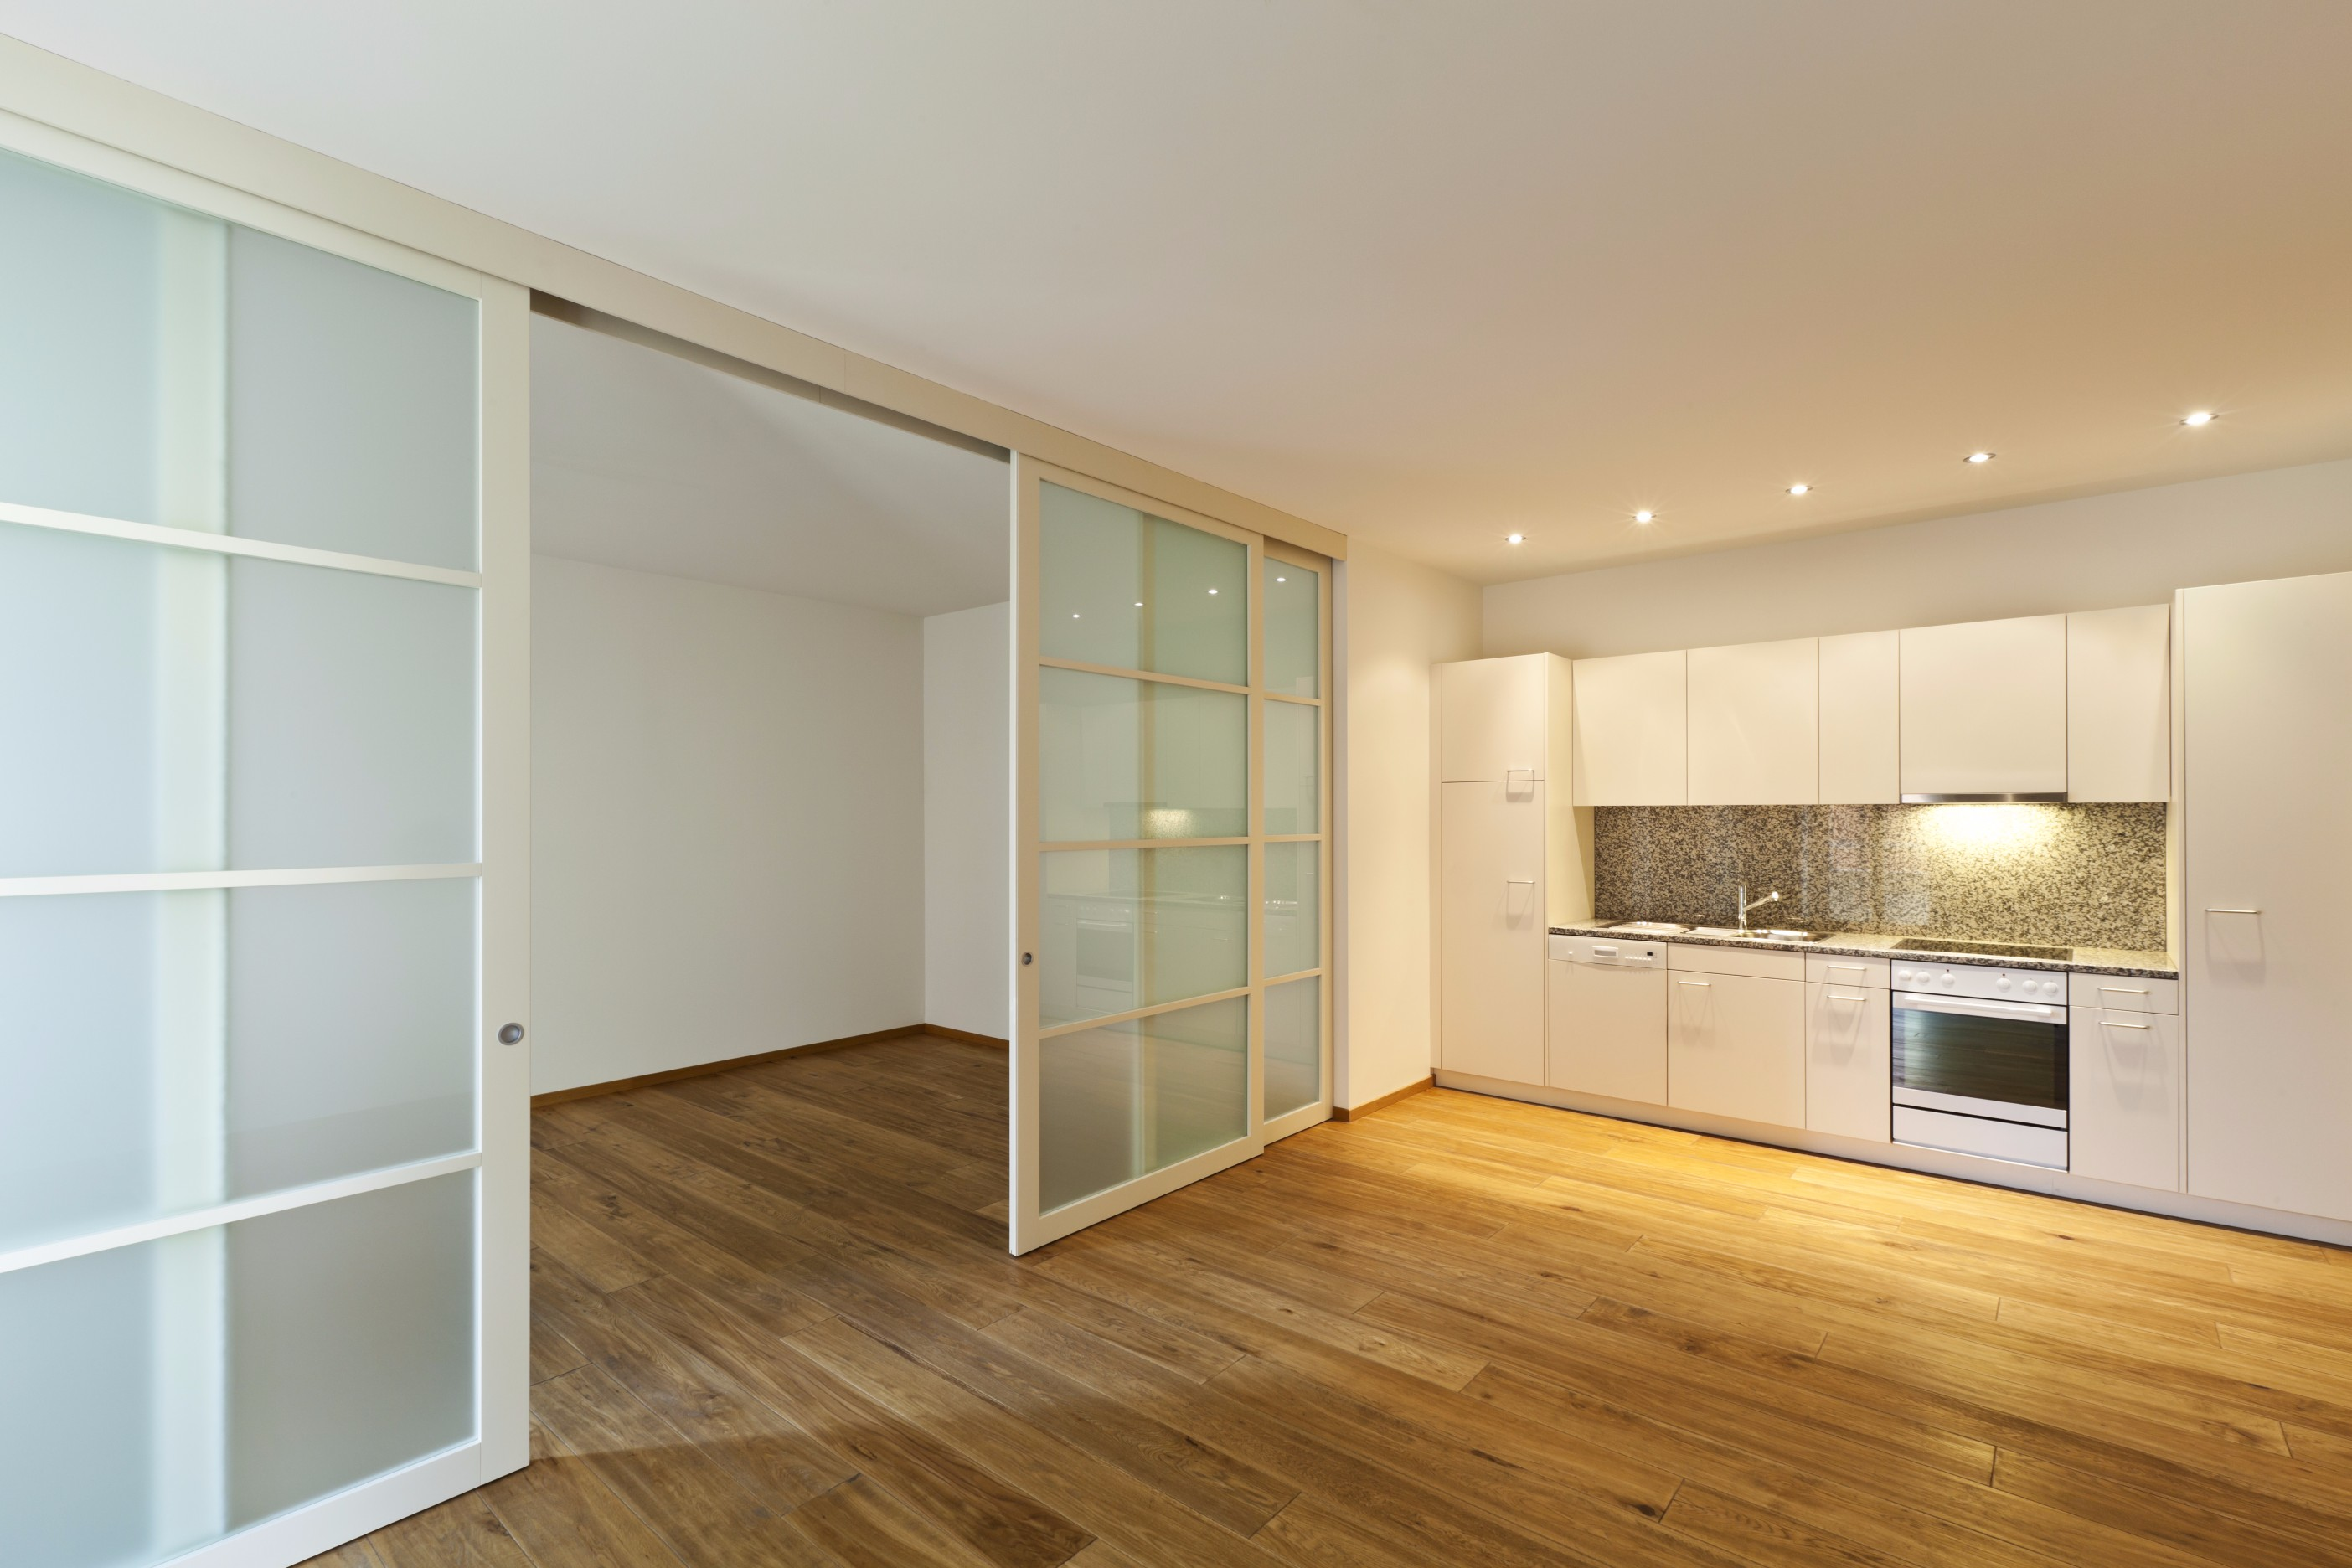 Glisanta-interior-M9050